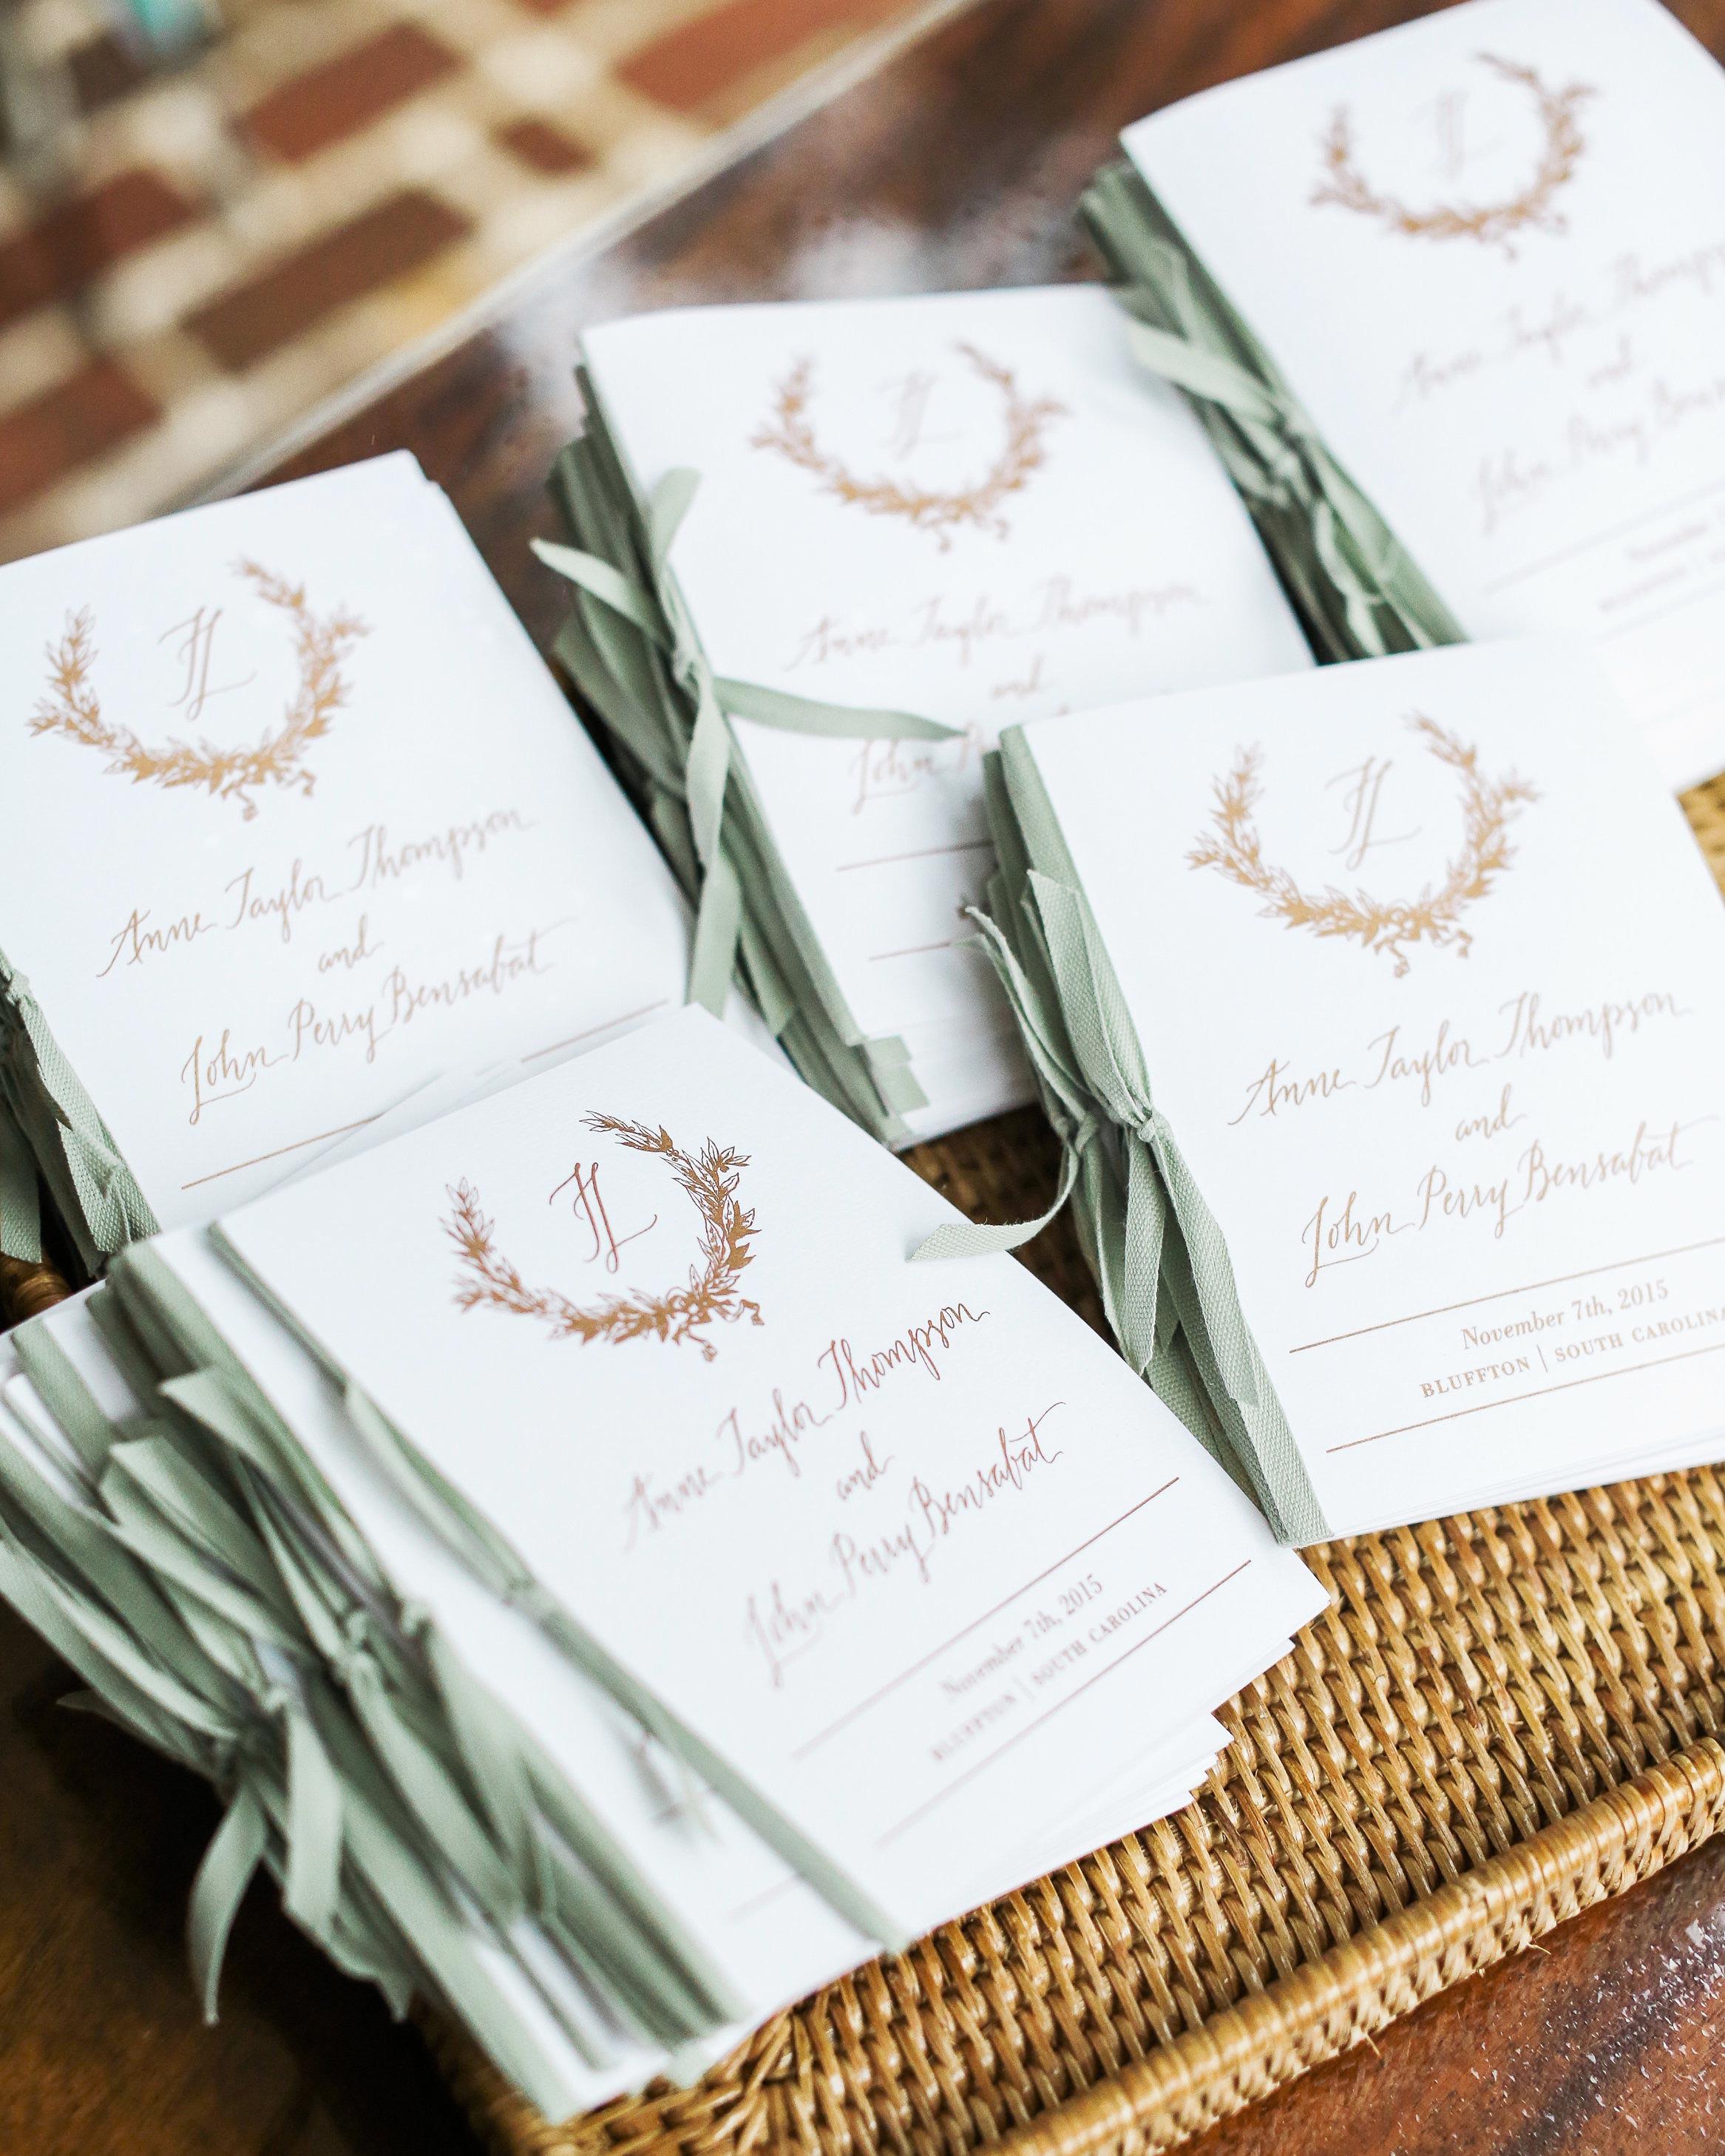 taylor-john-wedding-programs-c11-s113035-0616.jpg